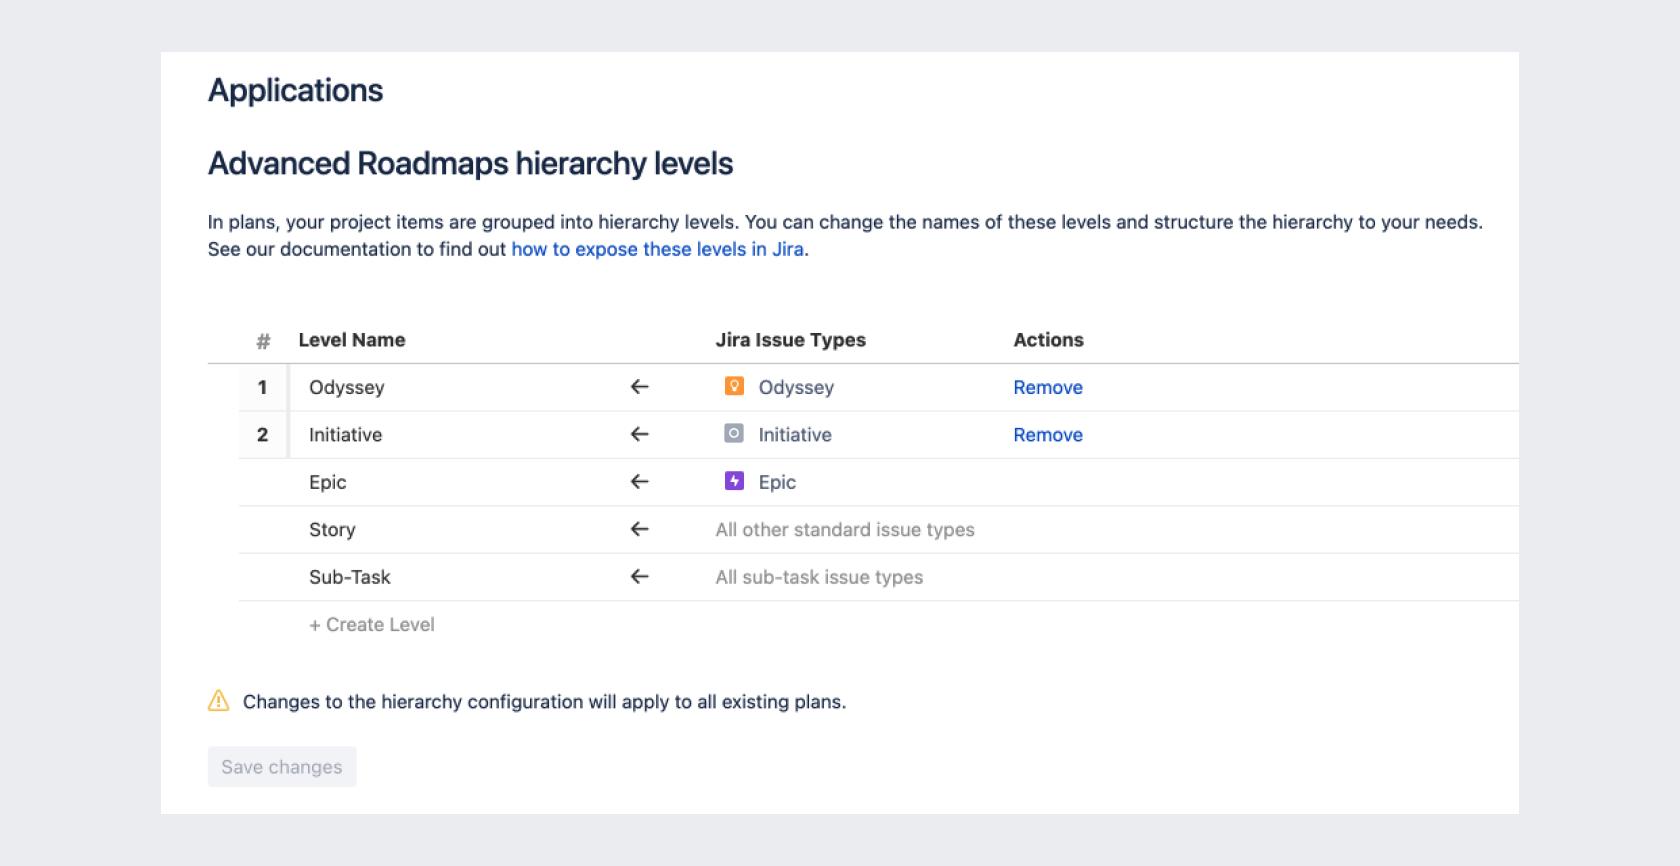 Hierarchieebenen in Advanced Roadmaps konfigurieren